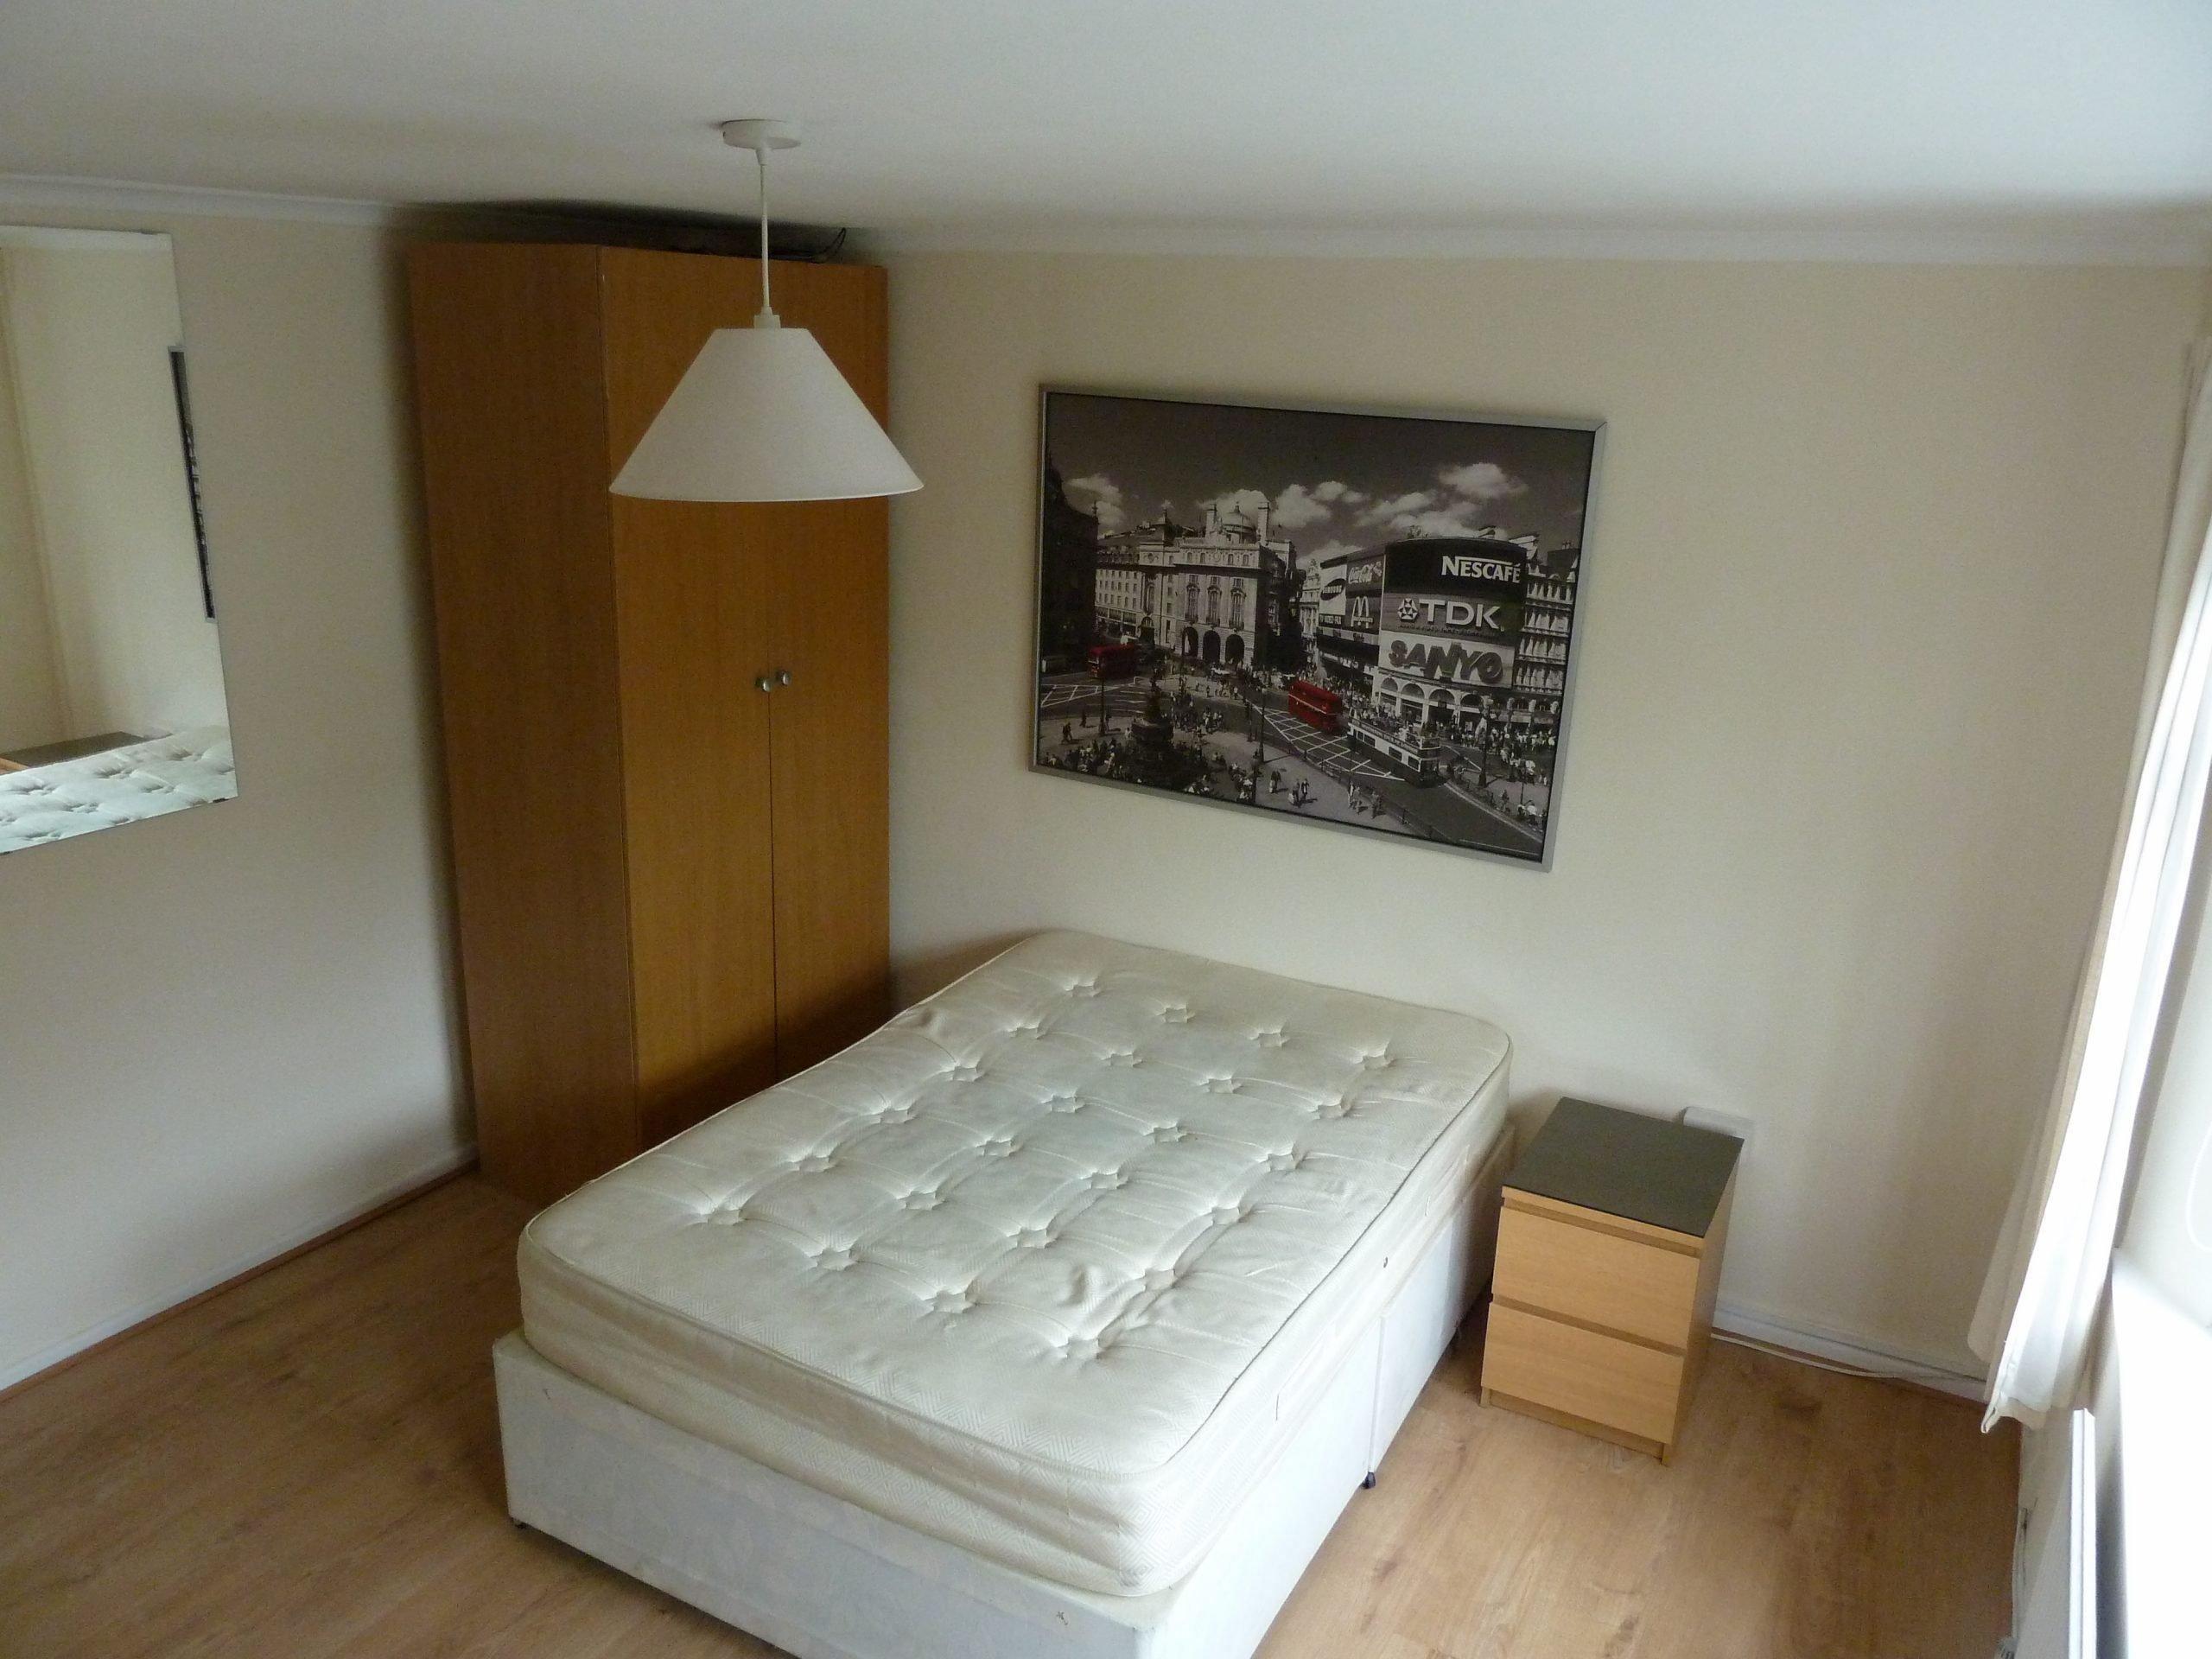 Colebrook Lane #3 – Room 2